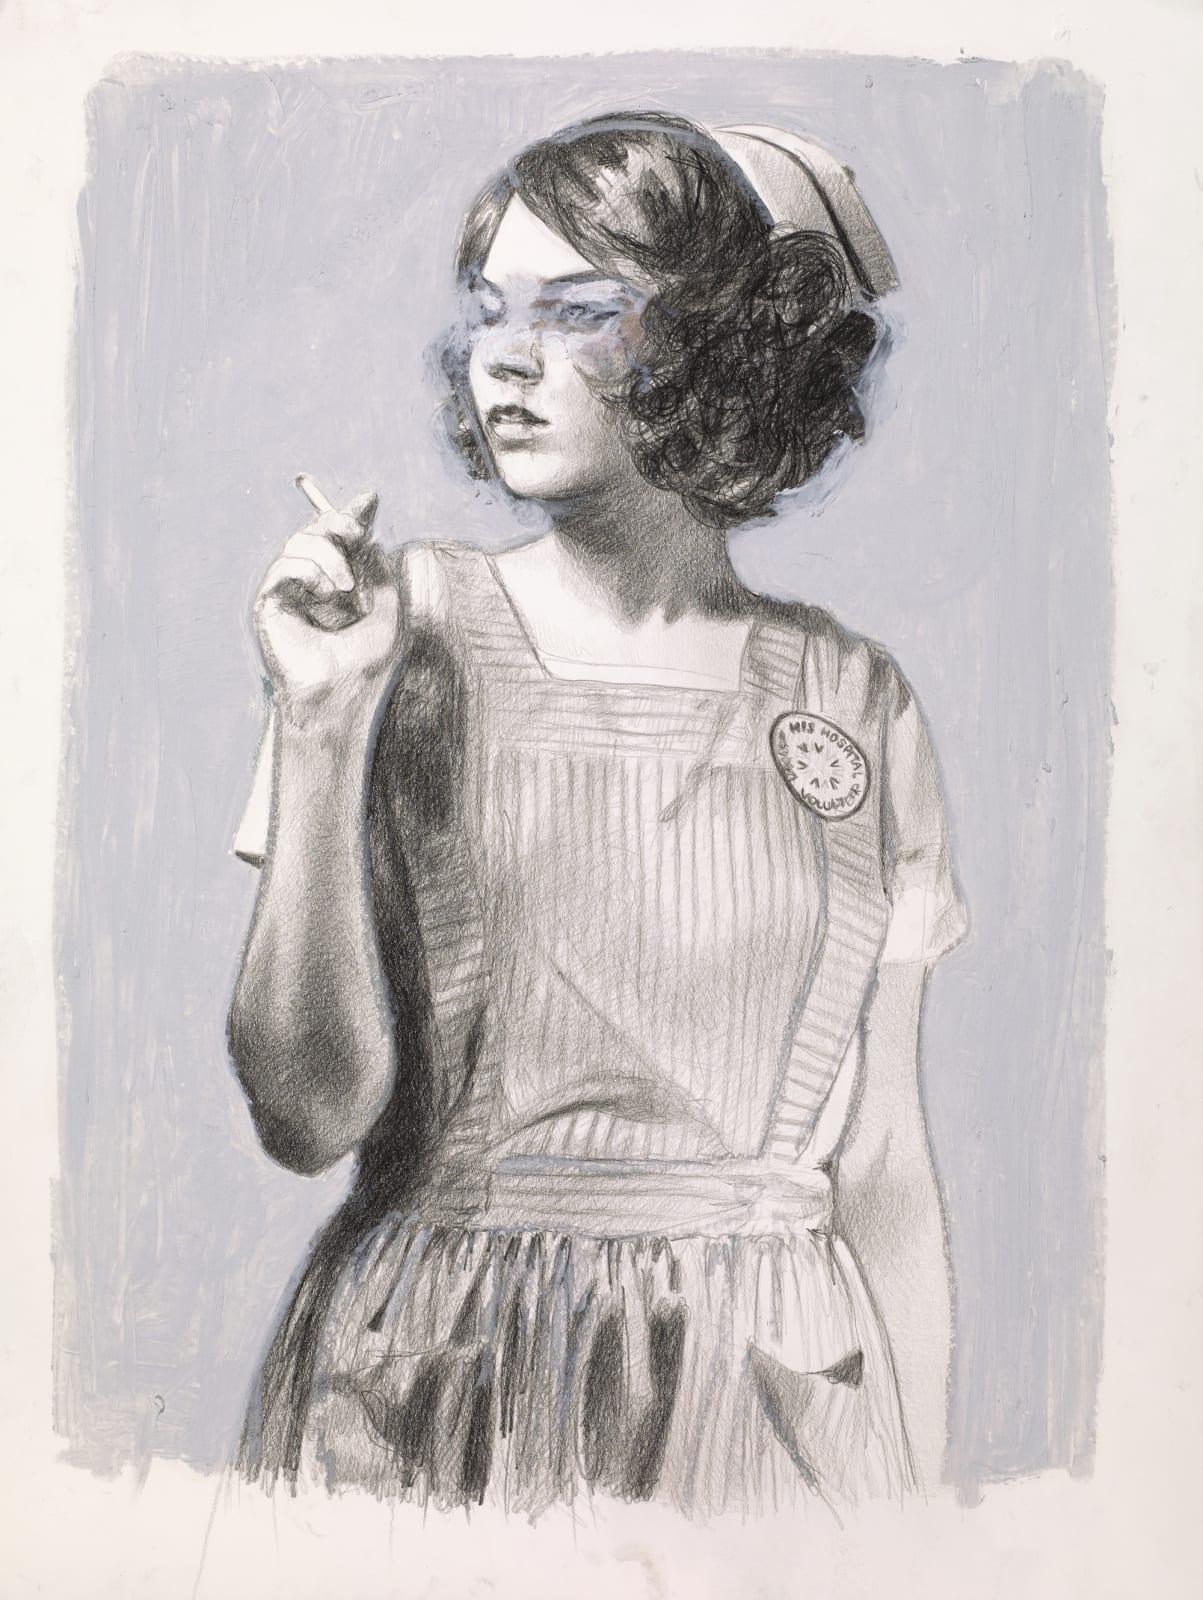 Mercedes Helnwein Candy striper smoking Pencil & oil pastel on paper 24 x 18